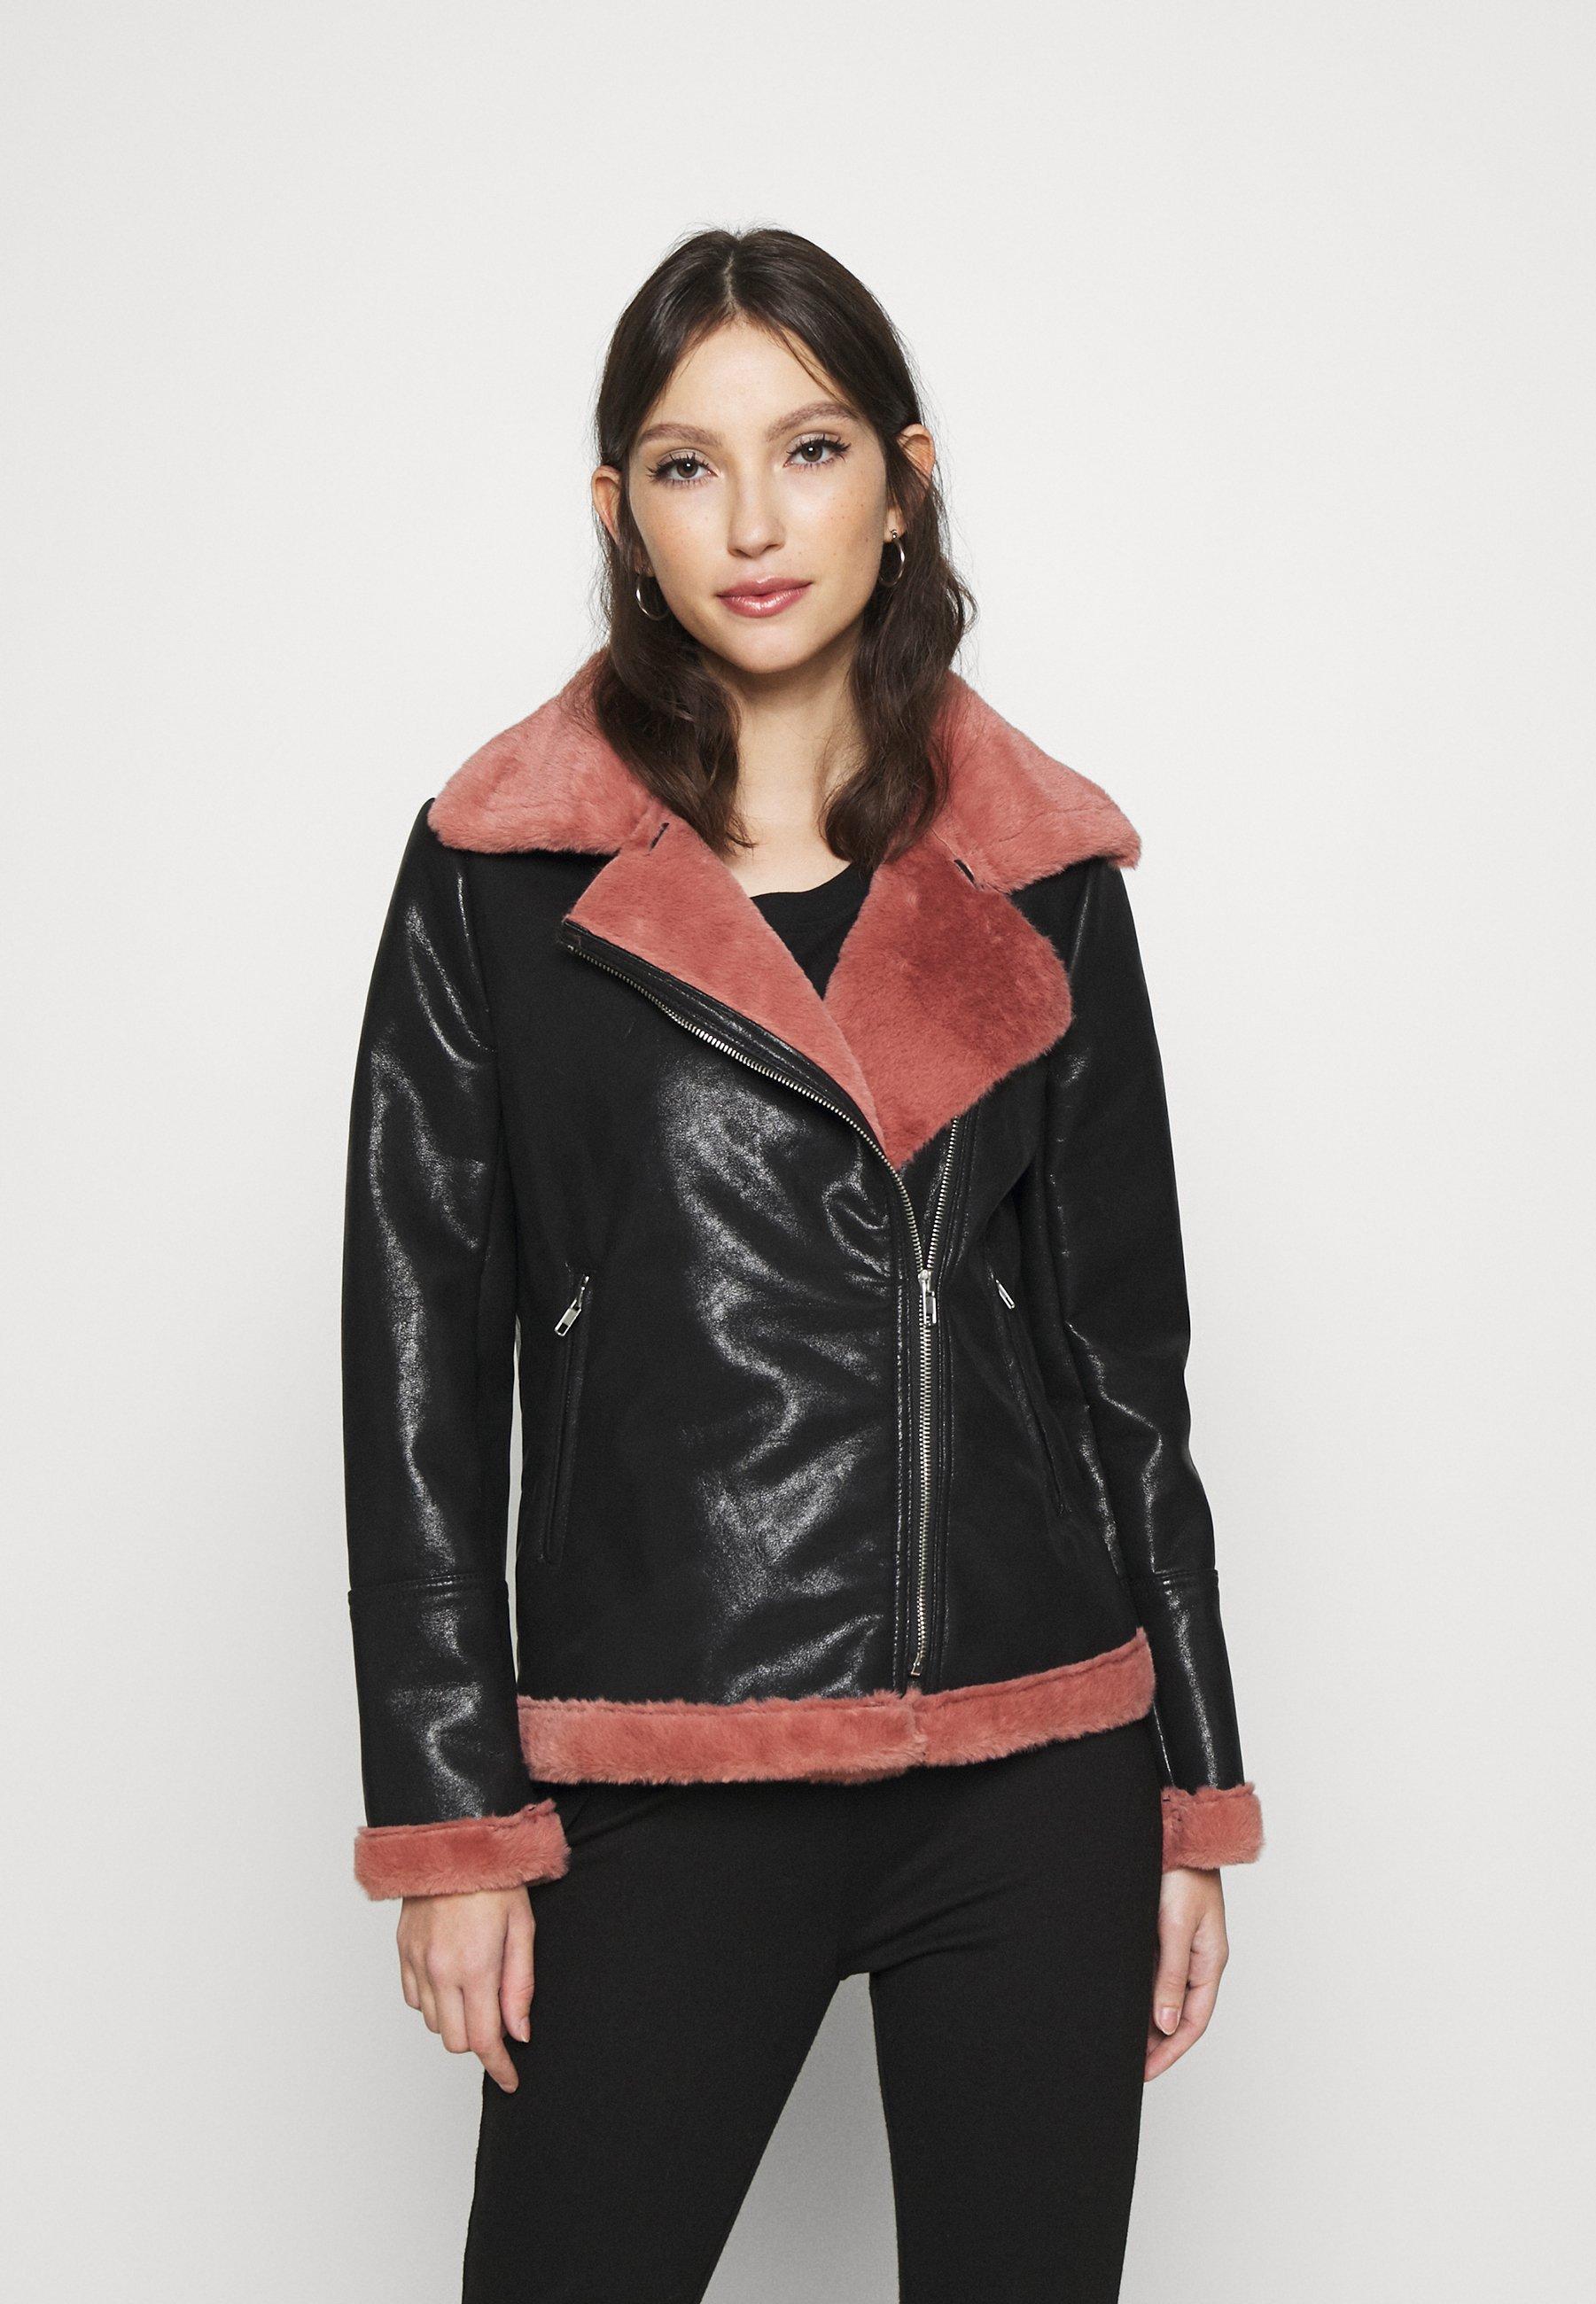 Women BIKER JACKET WITH LONG SLEEVES - Light jacket